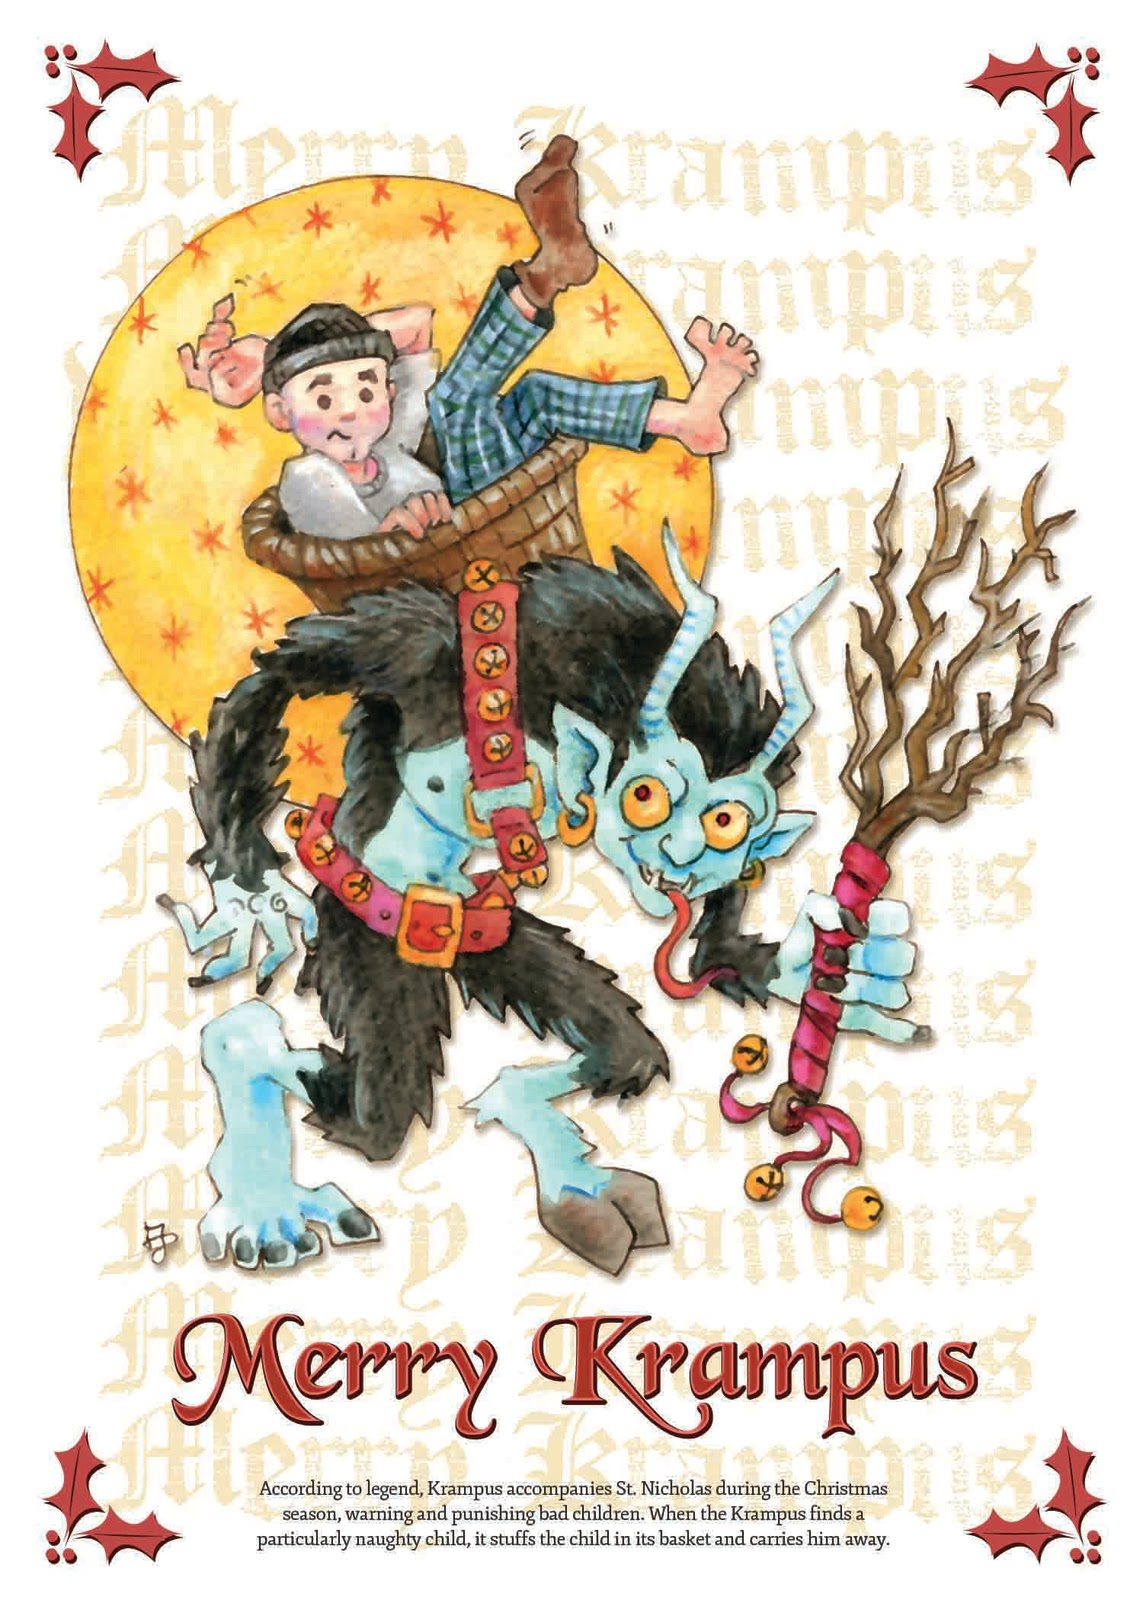 Jeff Davis Illustration: 2011 Christmas Card _ Merry Krampus